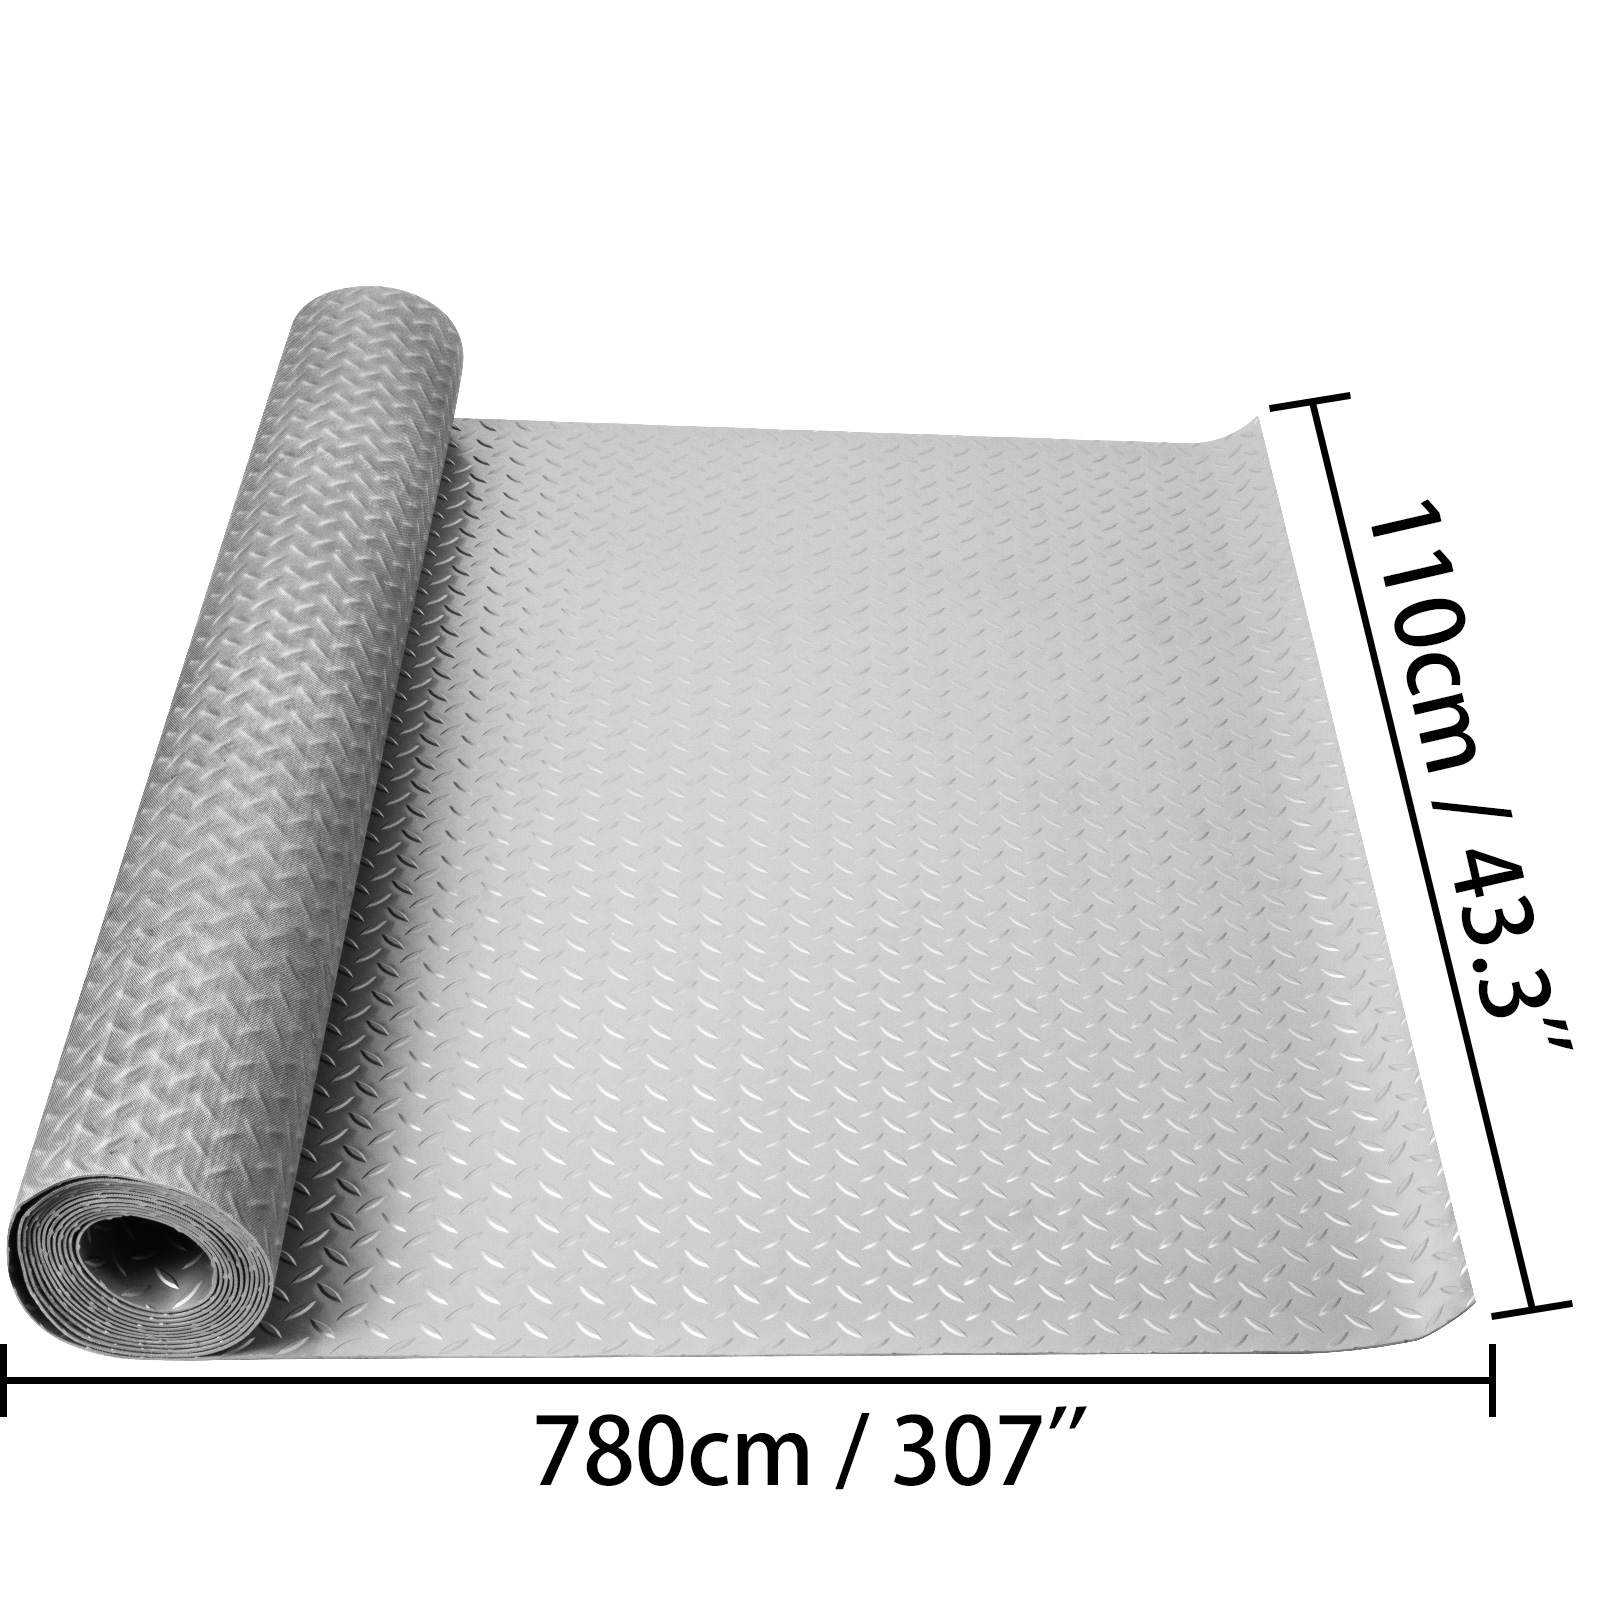 thumbnail 116 - Garage Flooring Mat Roll Car Trailer Floor Covering 1.1m Width Gym Floor Roll